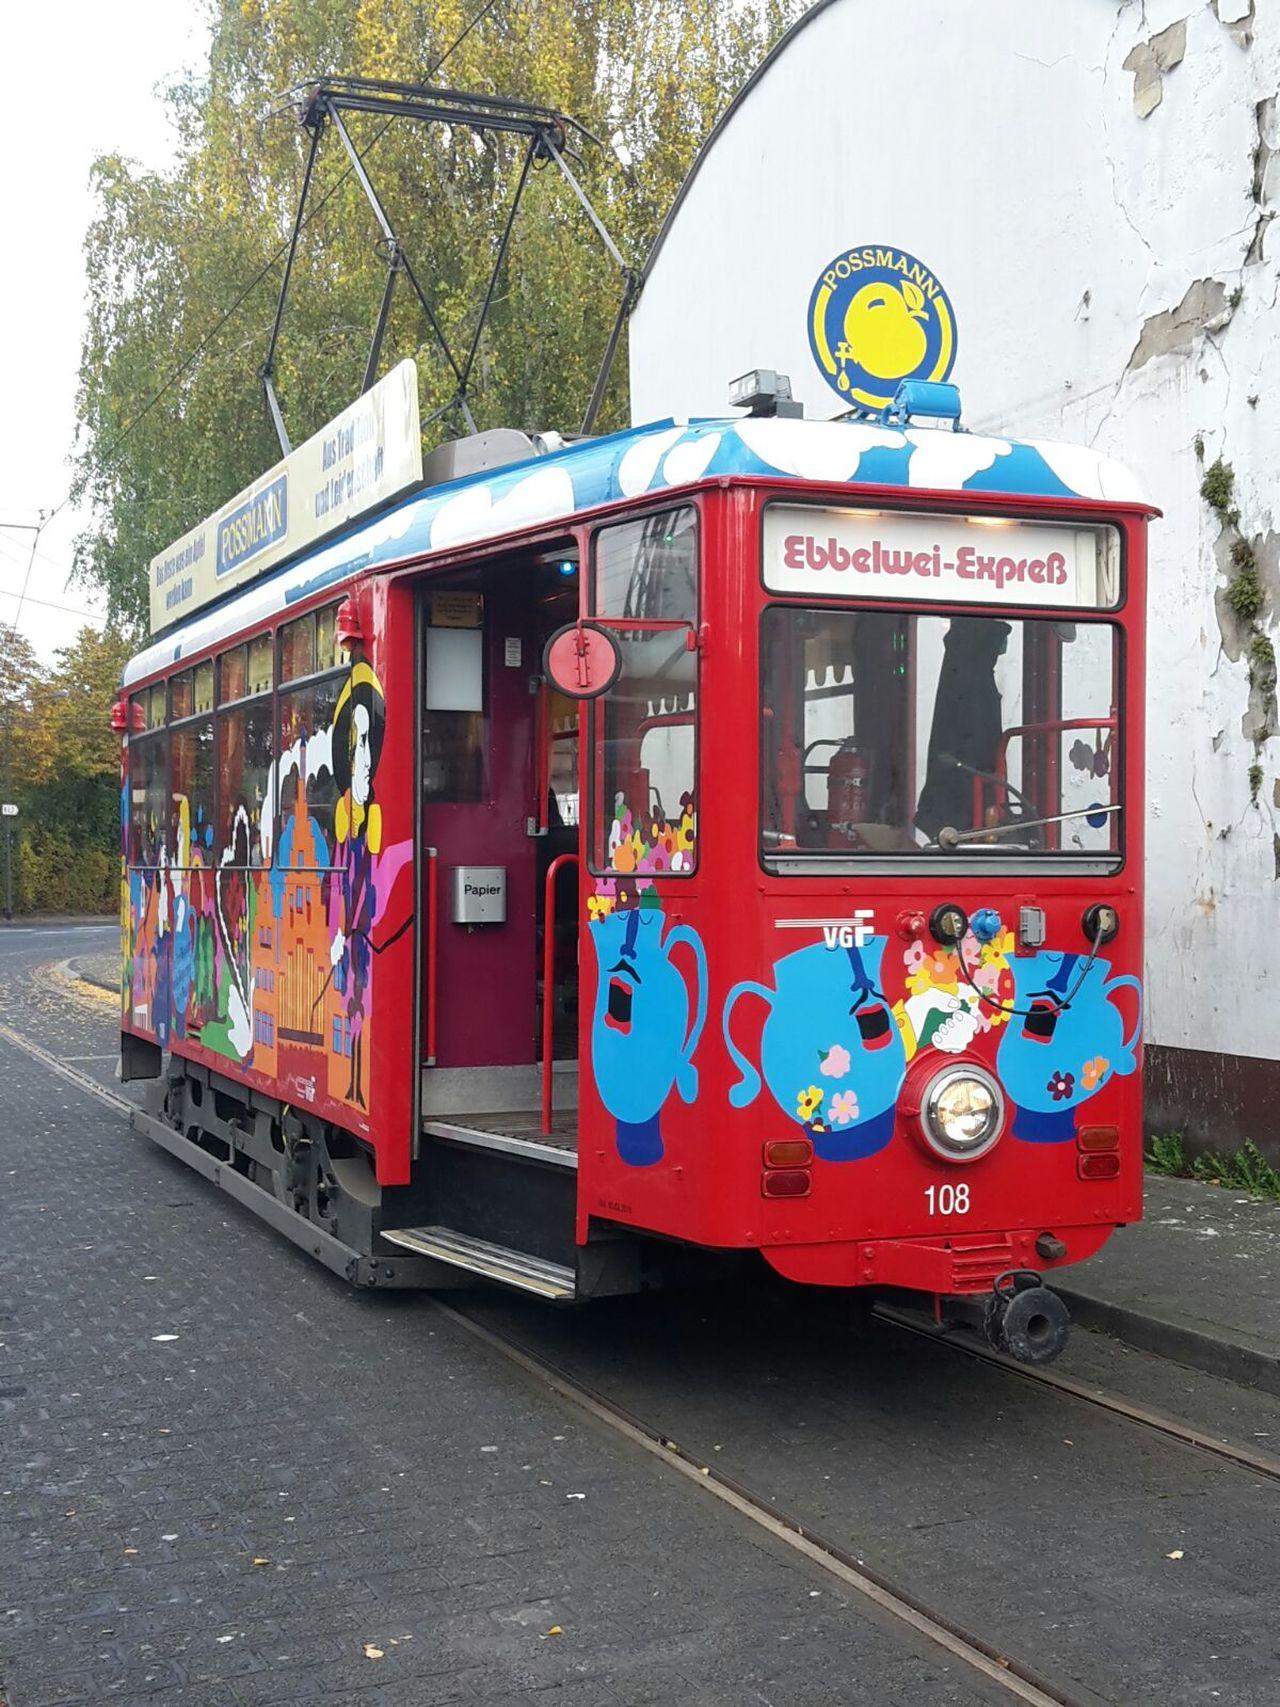 Frankfurt Frankfurt Am Main Tram Apfelwein Apple Wine Ebbelwoi Express Ebbelwoi Ebbelwei Express